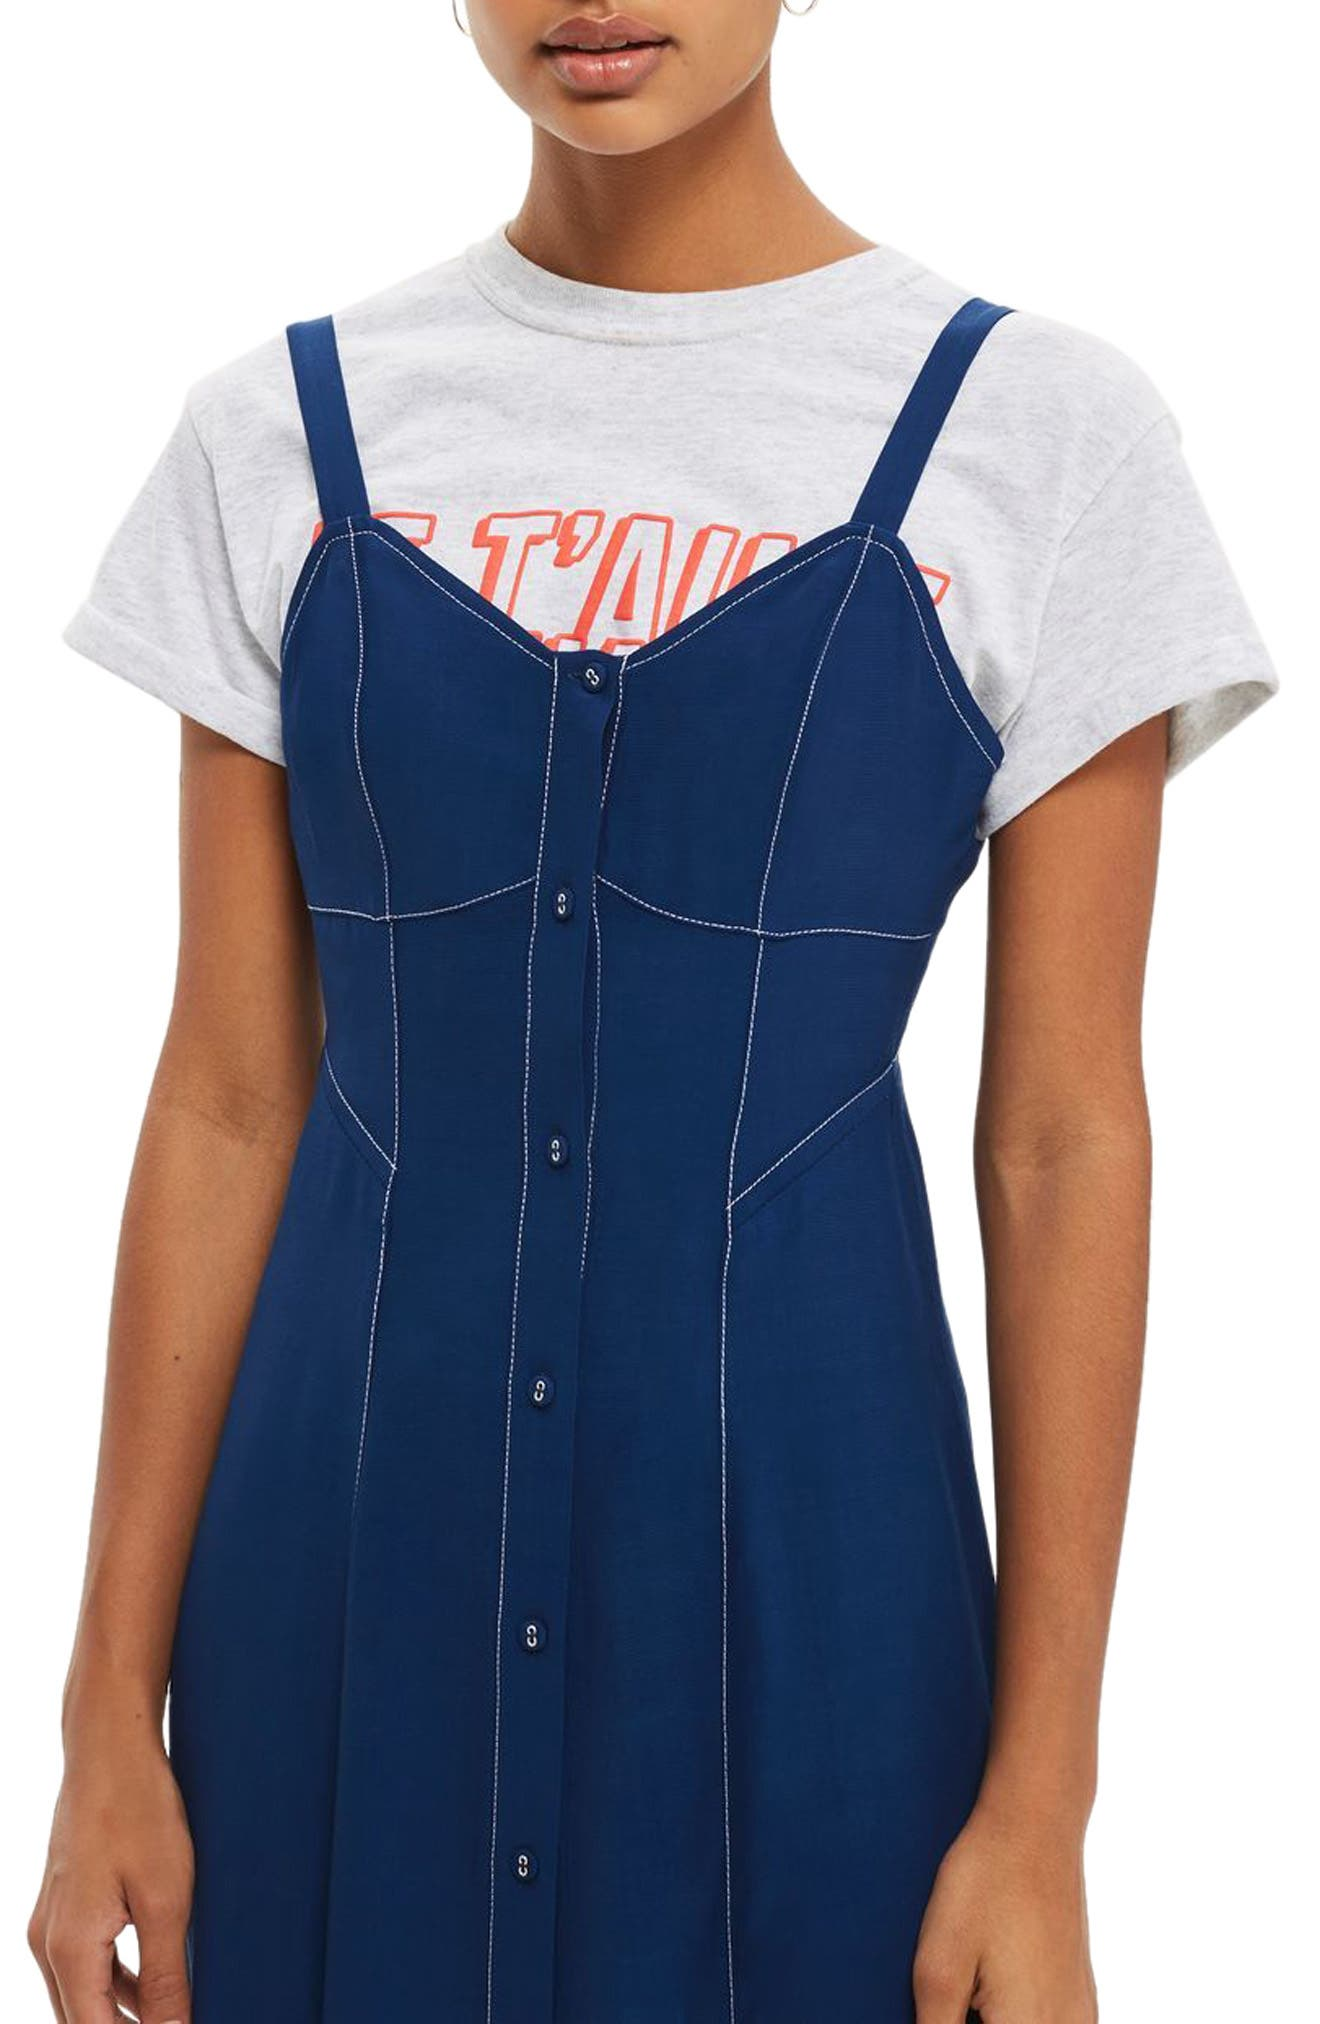 Topstitch Corset Midi Dress,                             Alternate thumbnail 2, color,                             410